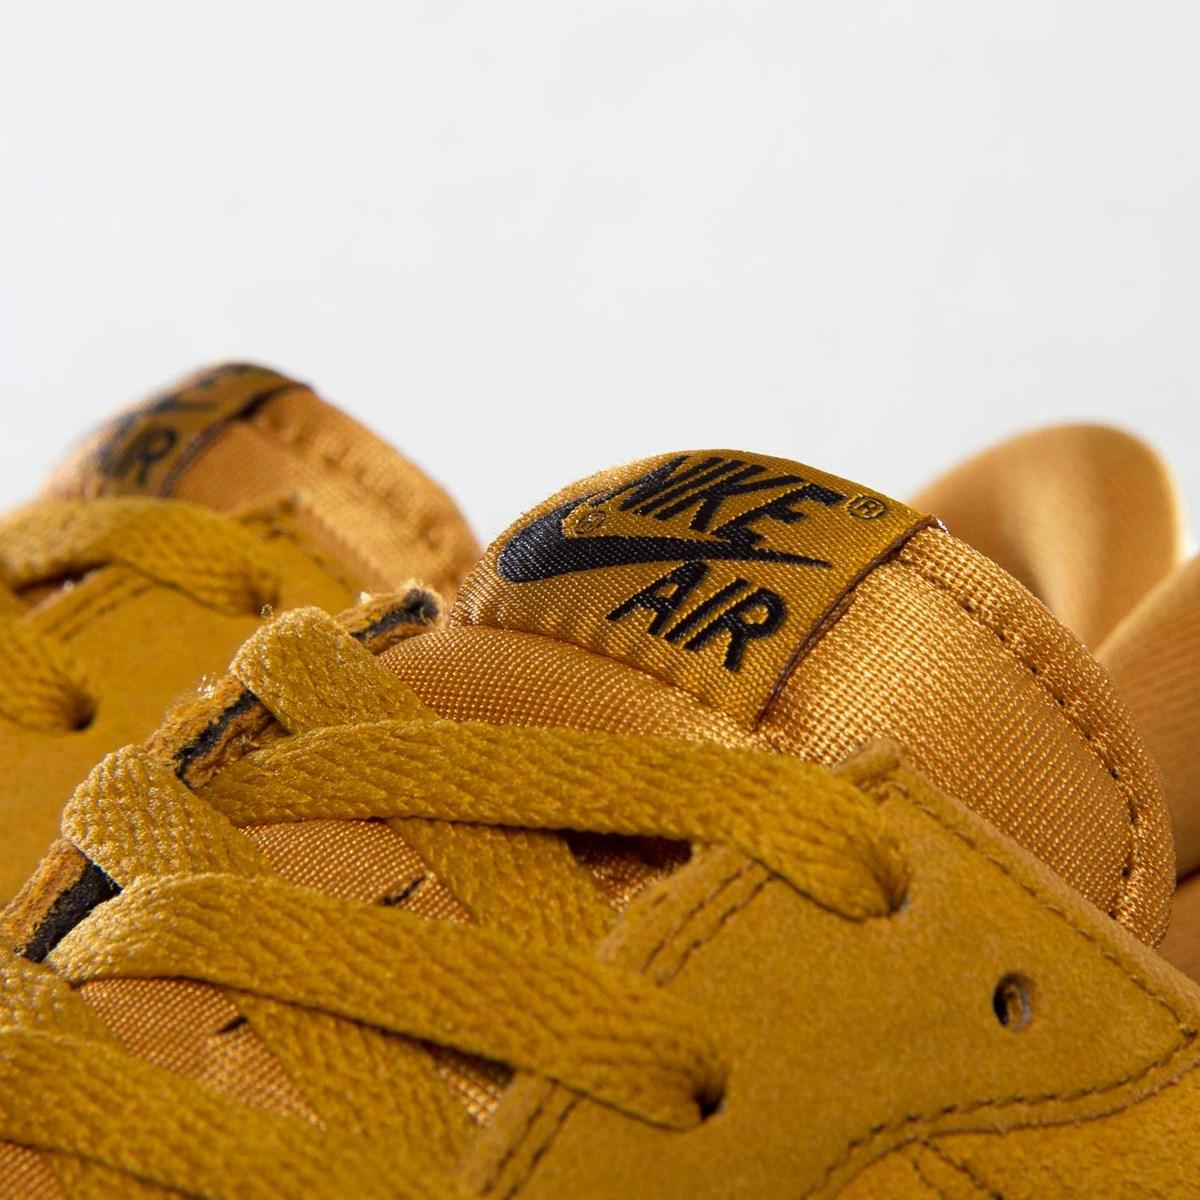 f09dc6e59db28 Nike Air Pegasus 83 Suede - 599129-770 - Sneakersnstuff